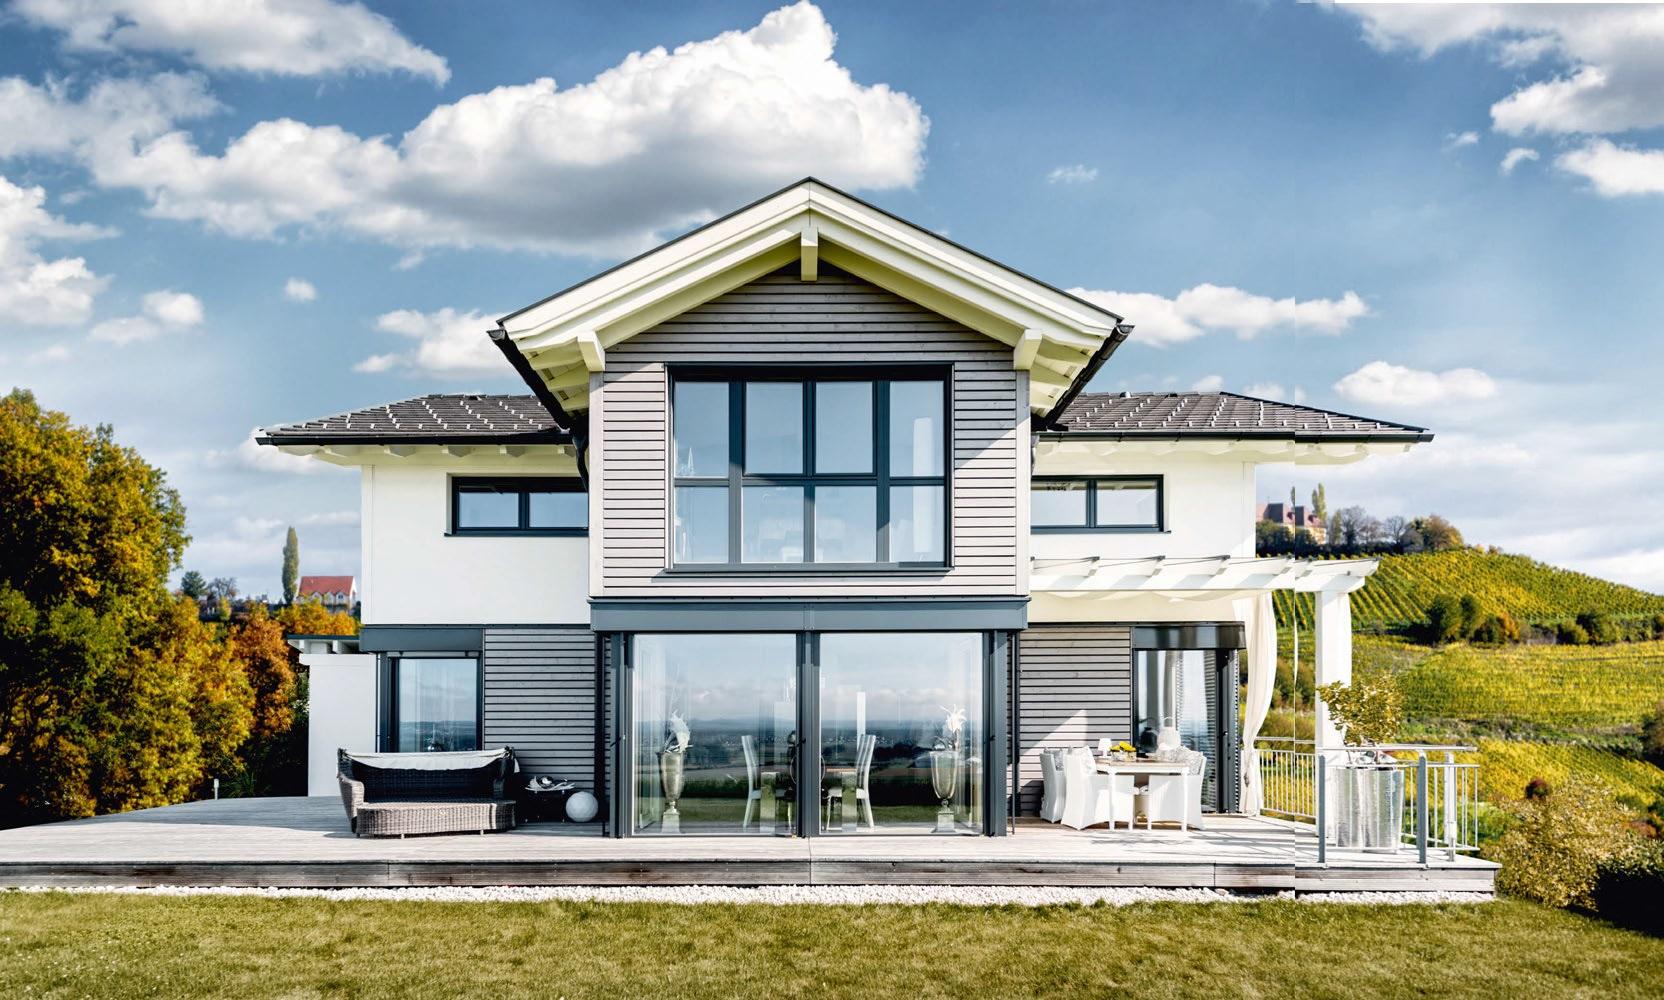 Ecologica bella su misura una casa prefabbricata da - Casa ecologica prefabbricata prezzi ...